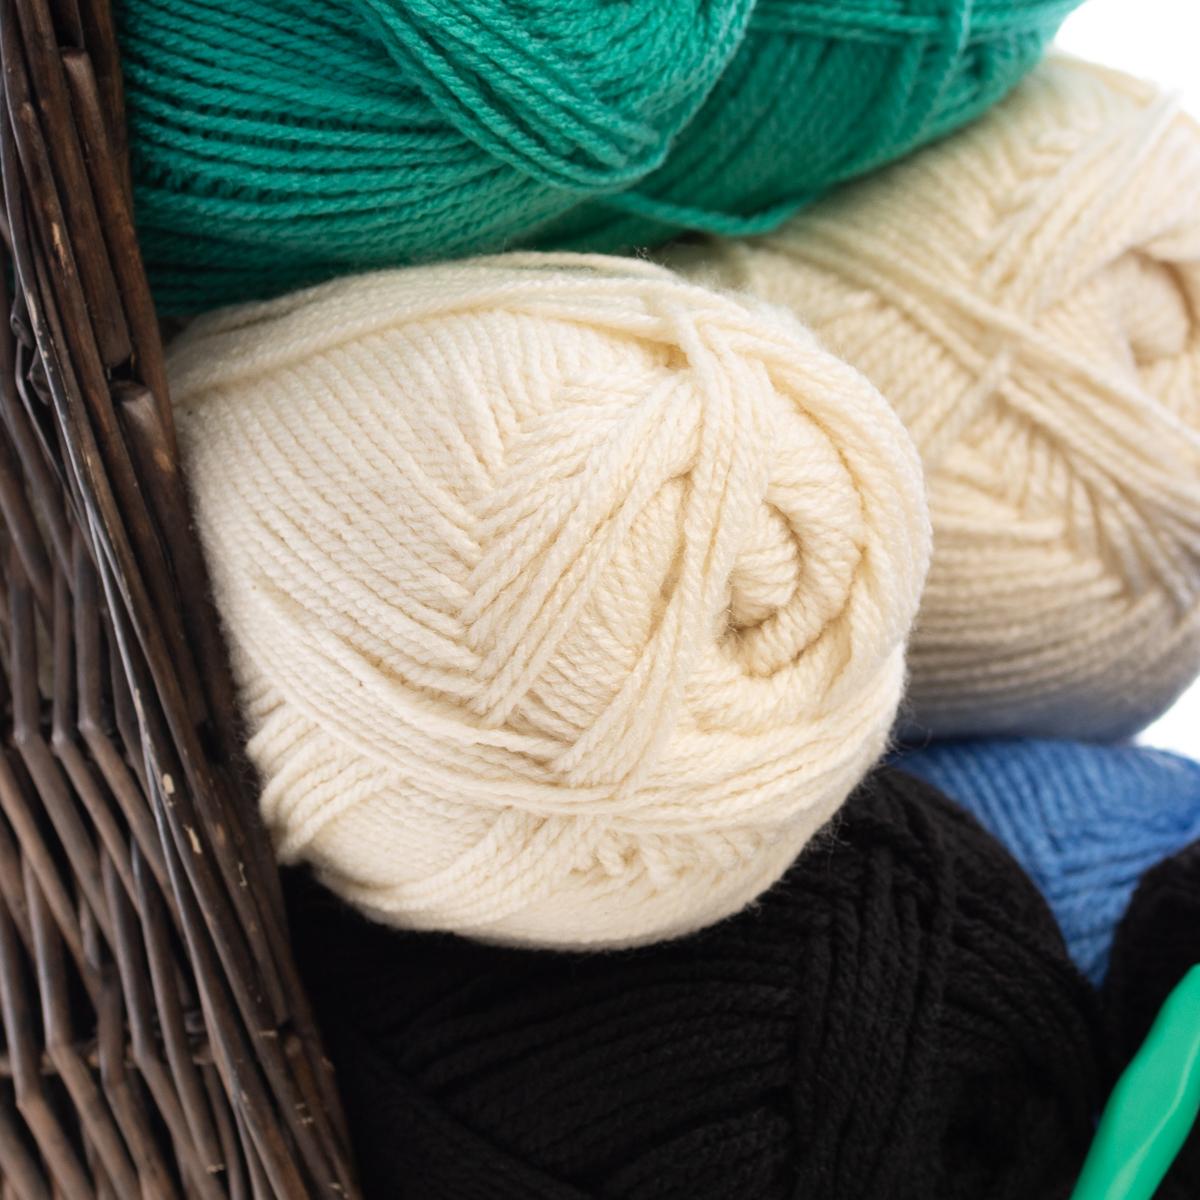 4-Dream-Weaver-Solid-S-Twist-100-Acrylic-Yarn-Skeins-Light-3-Knit-Crochet-Soft thumbnail 9